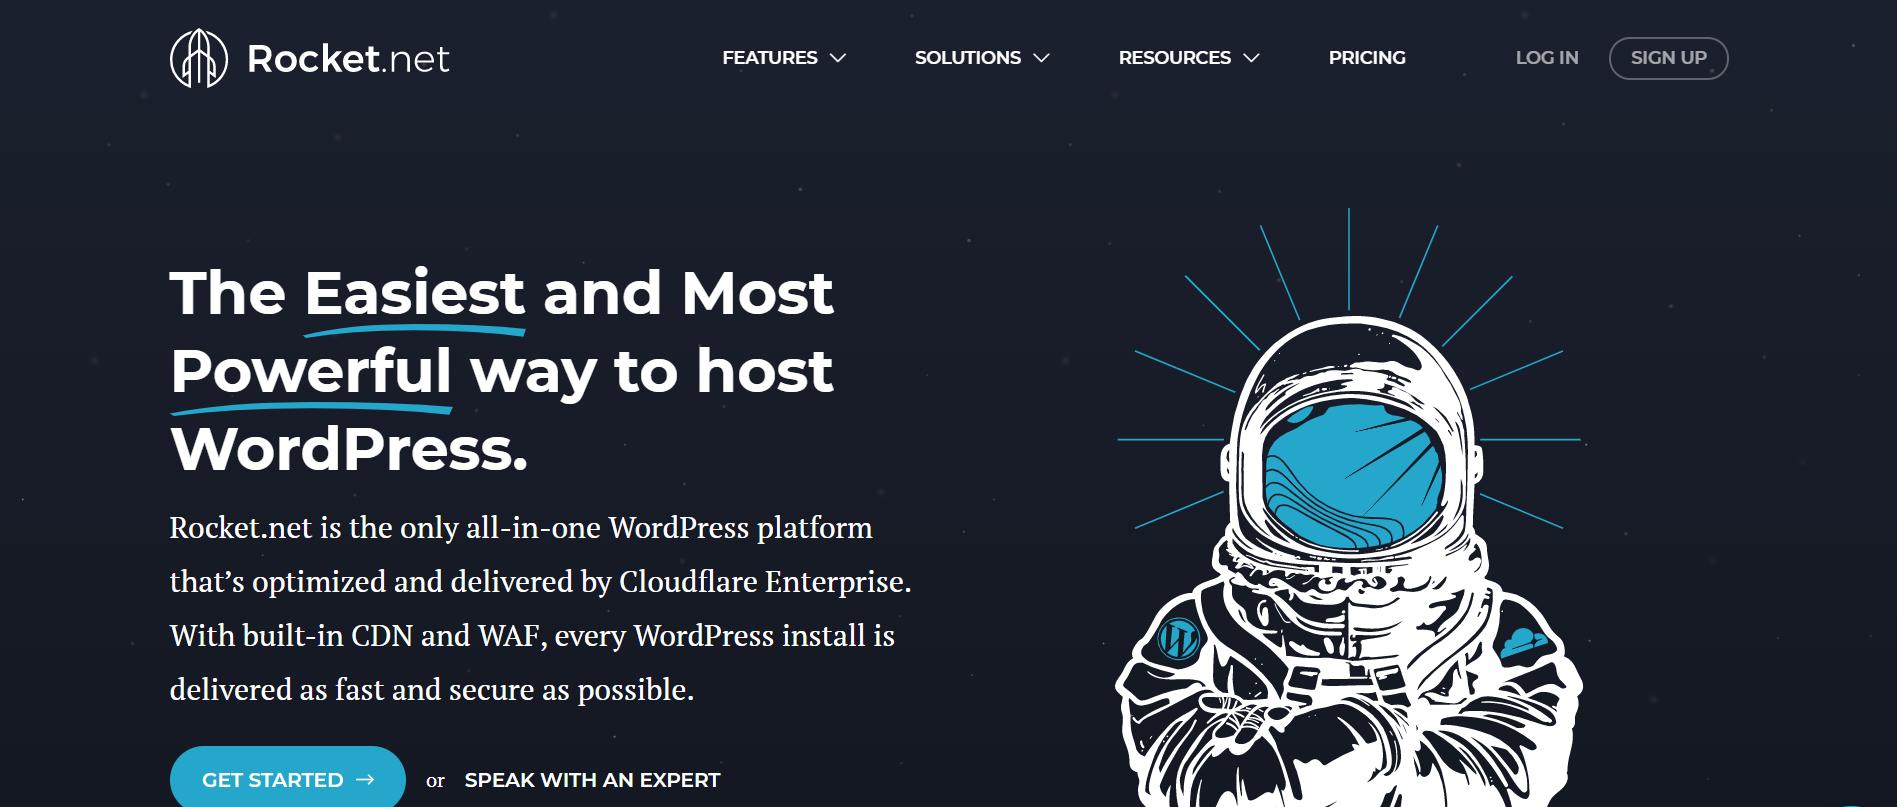 rocket.net homepage